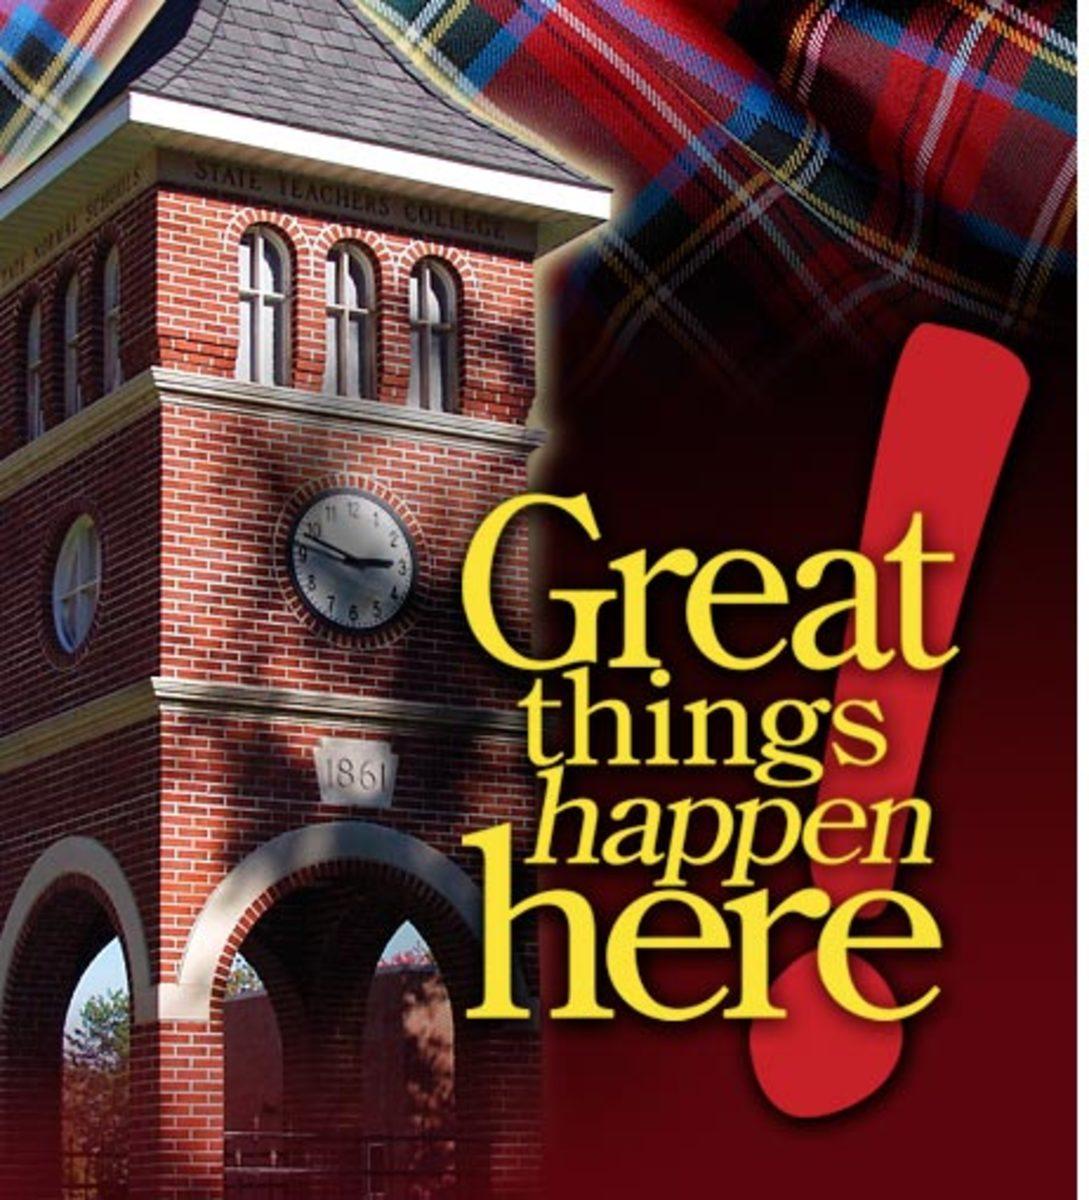 Edinboro University: Tips, Fun Facts, and Warnings